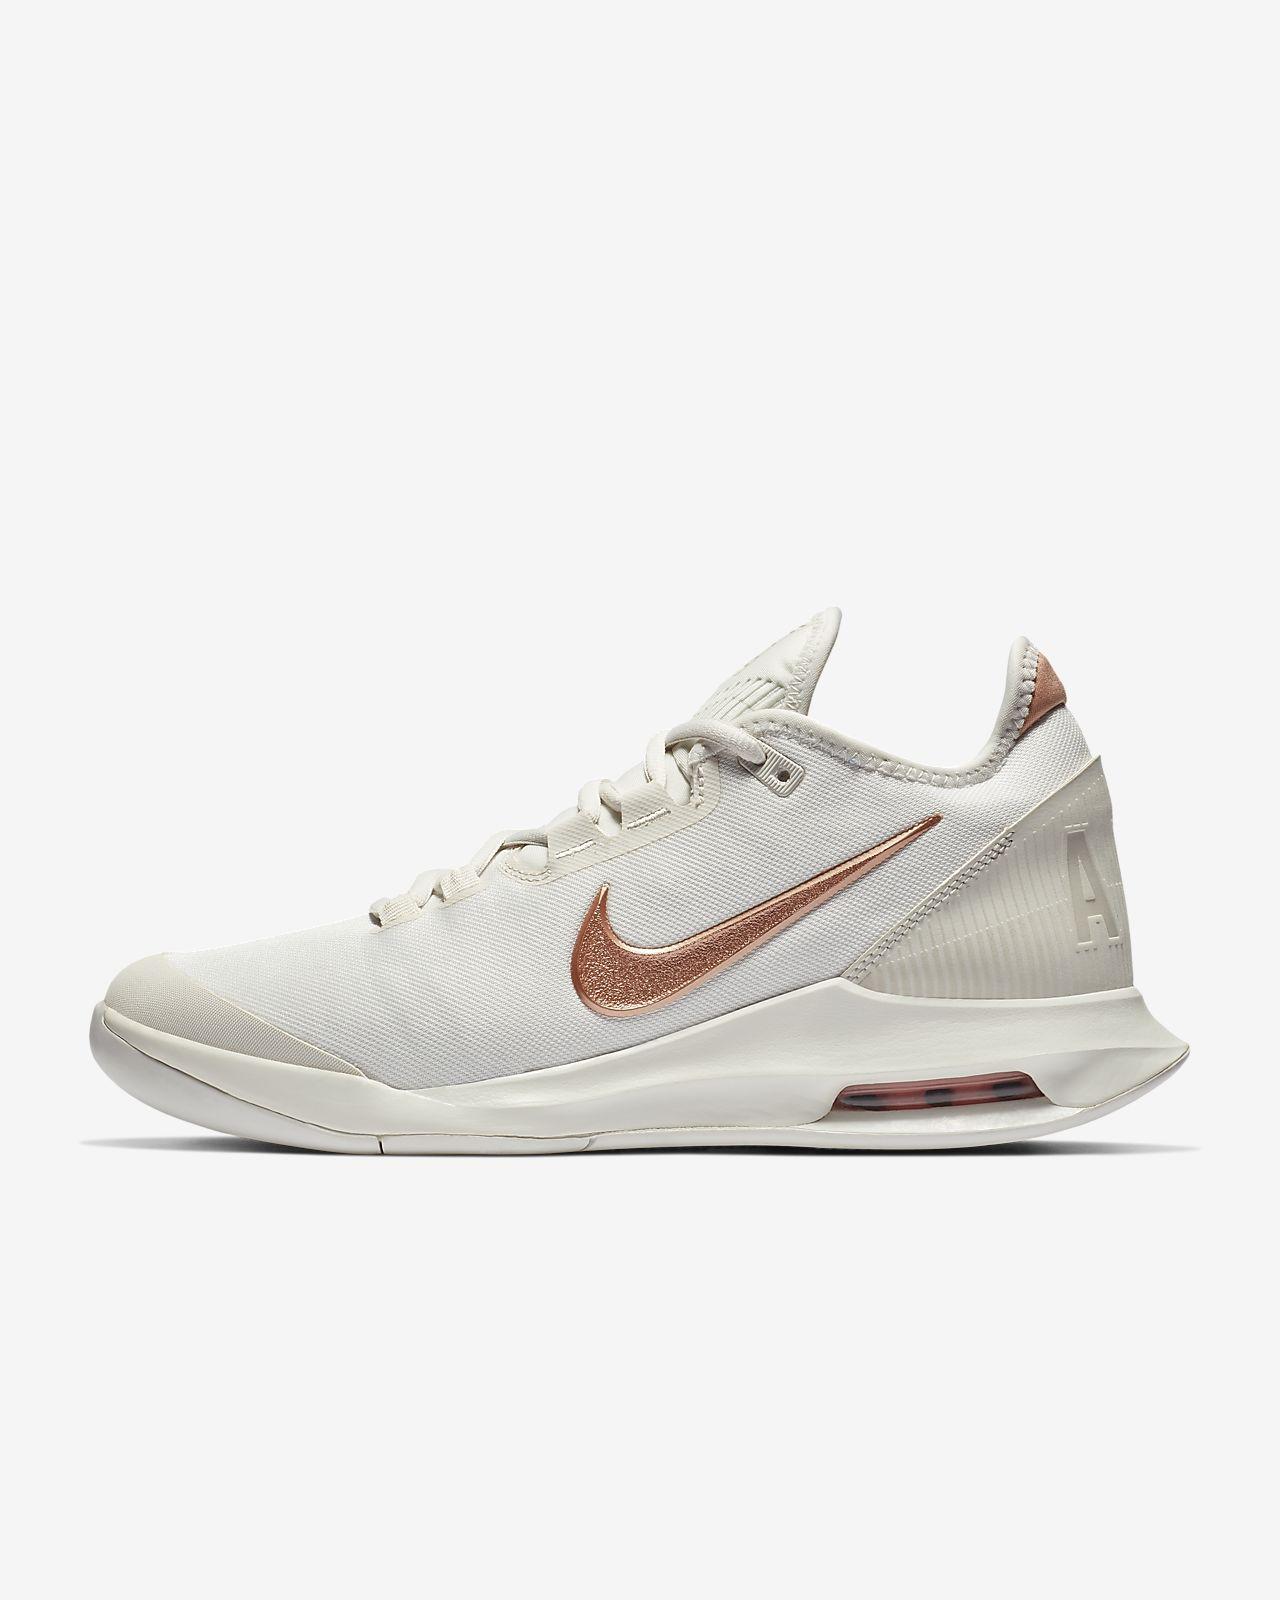 finest selection fbdd4 c8ede ... NikeCourt Air Max Wildcard Women s Tennis Shoe